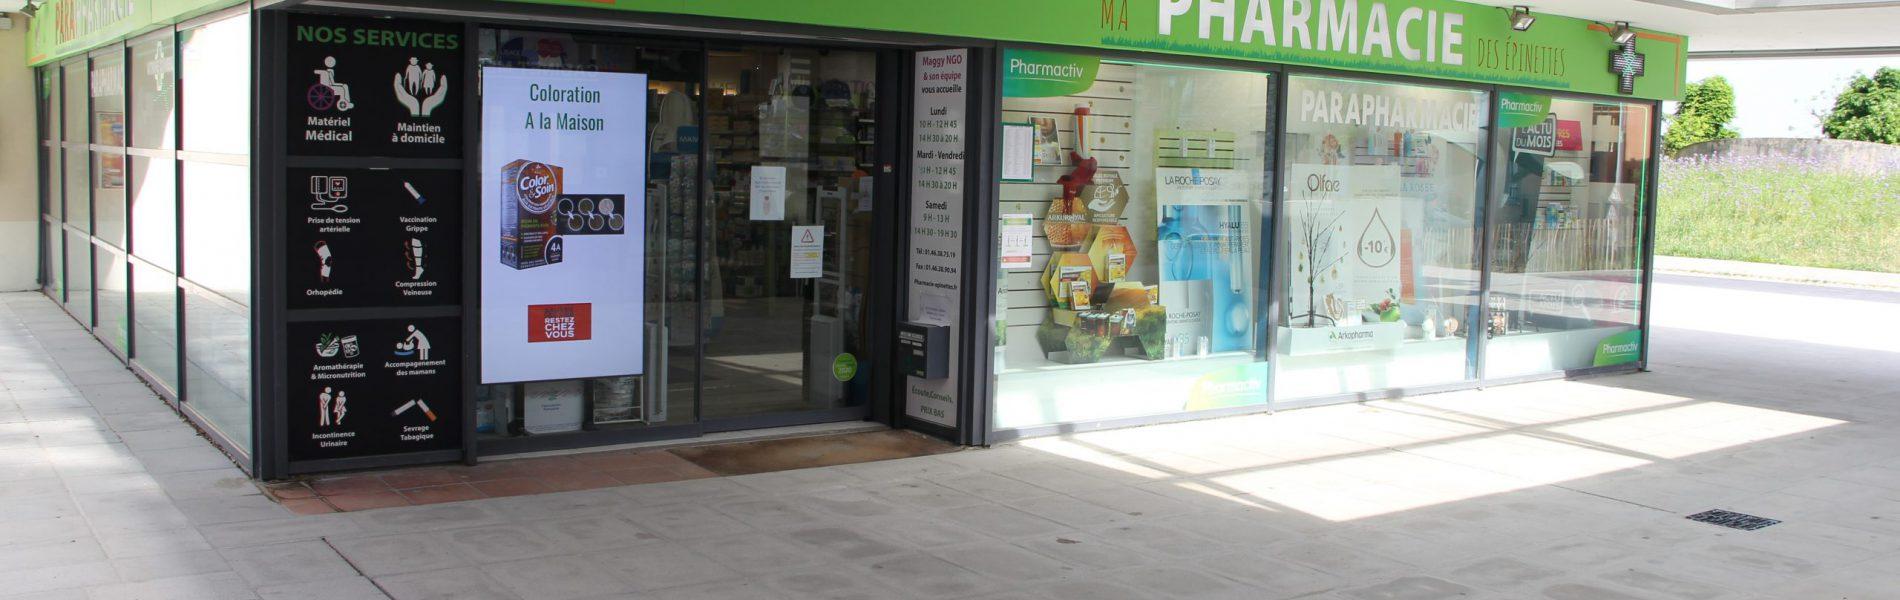 Pharmacie DES EPINETTES - Image Homepage 4